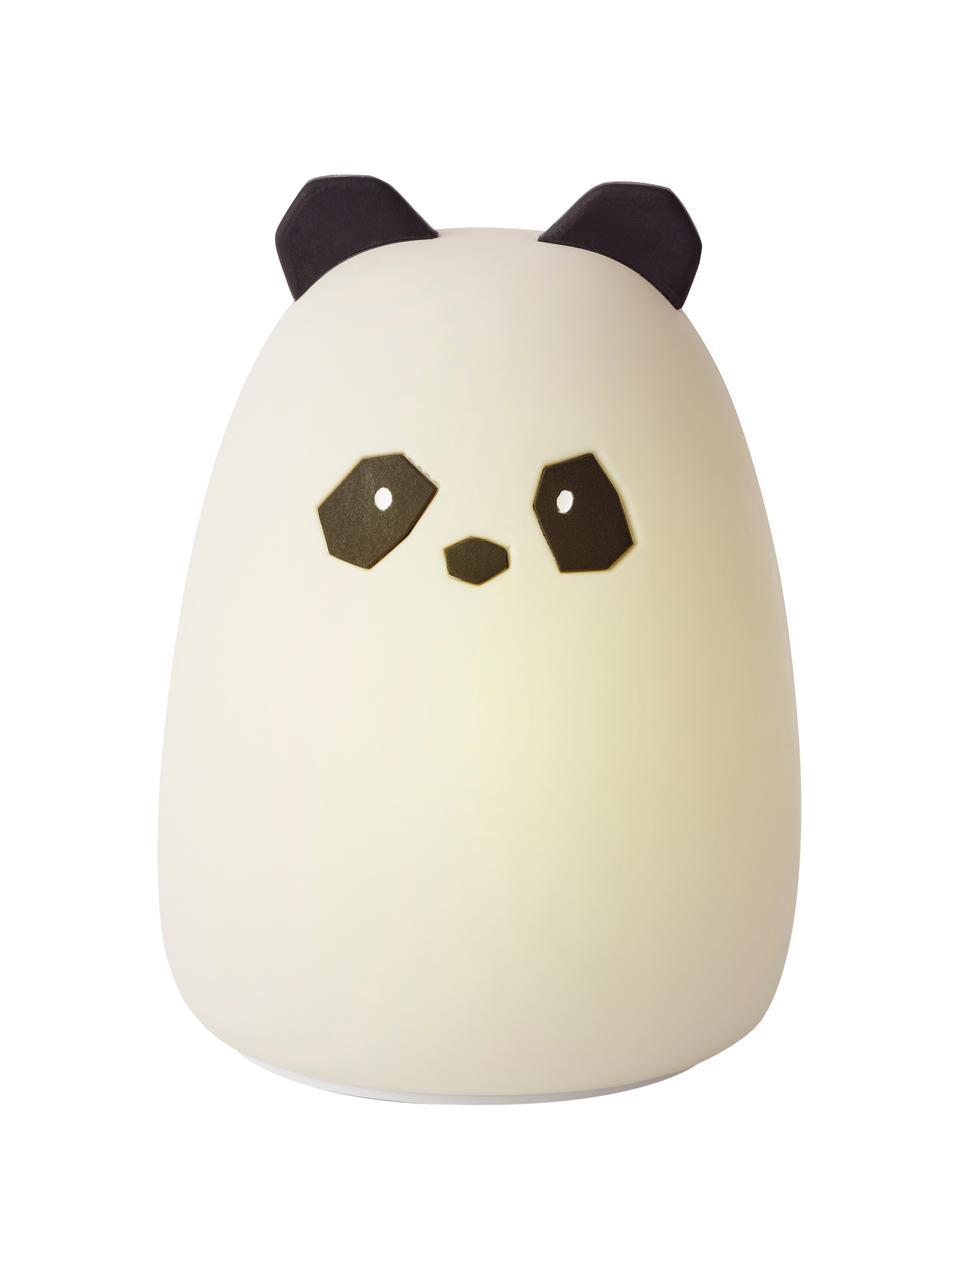 LED-Leuchtobjekt Winston Panda, 100% Silikon, BPA-frei, Weiß, Ø 11 x H 14 cm